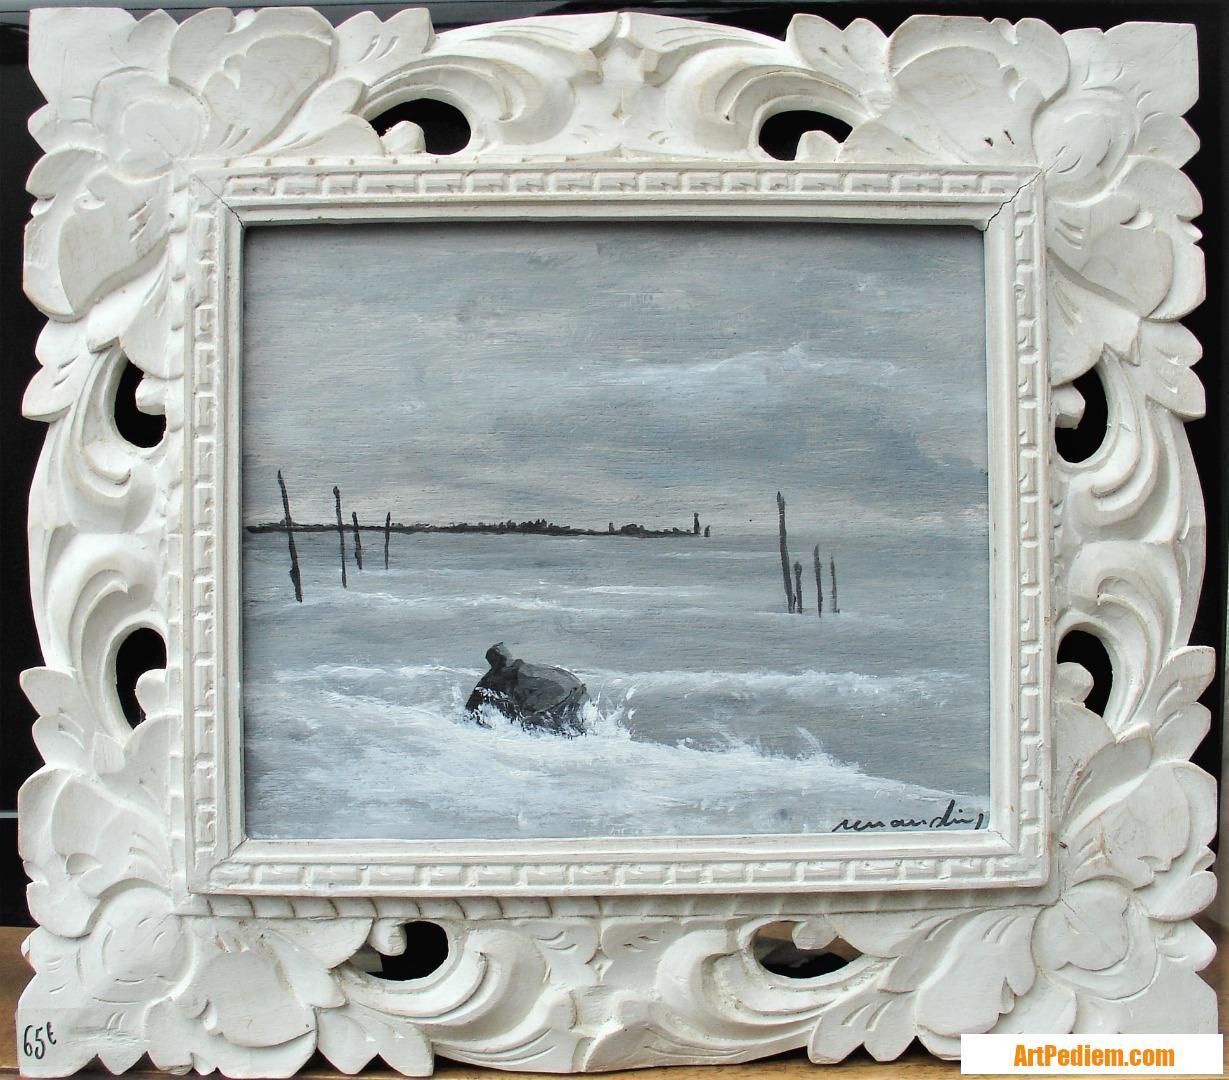 Oeuvre Bouée de l'Artiste Jean louis Renaudin